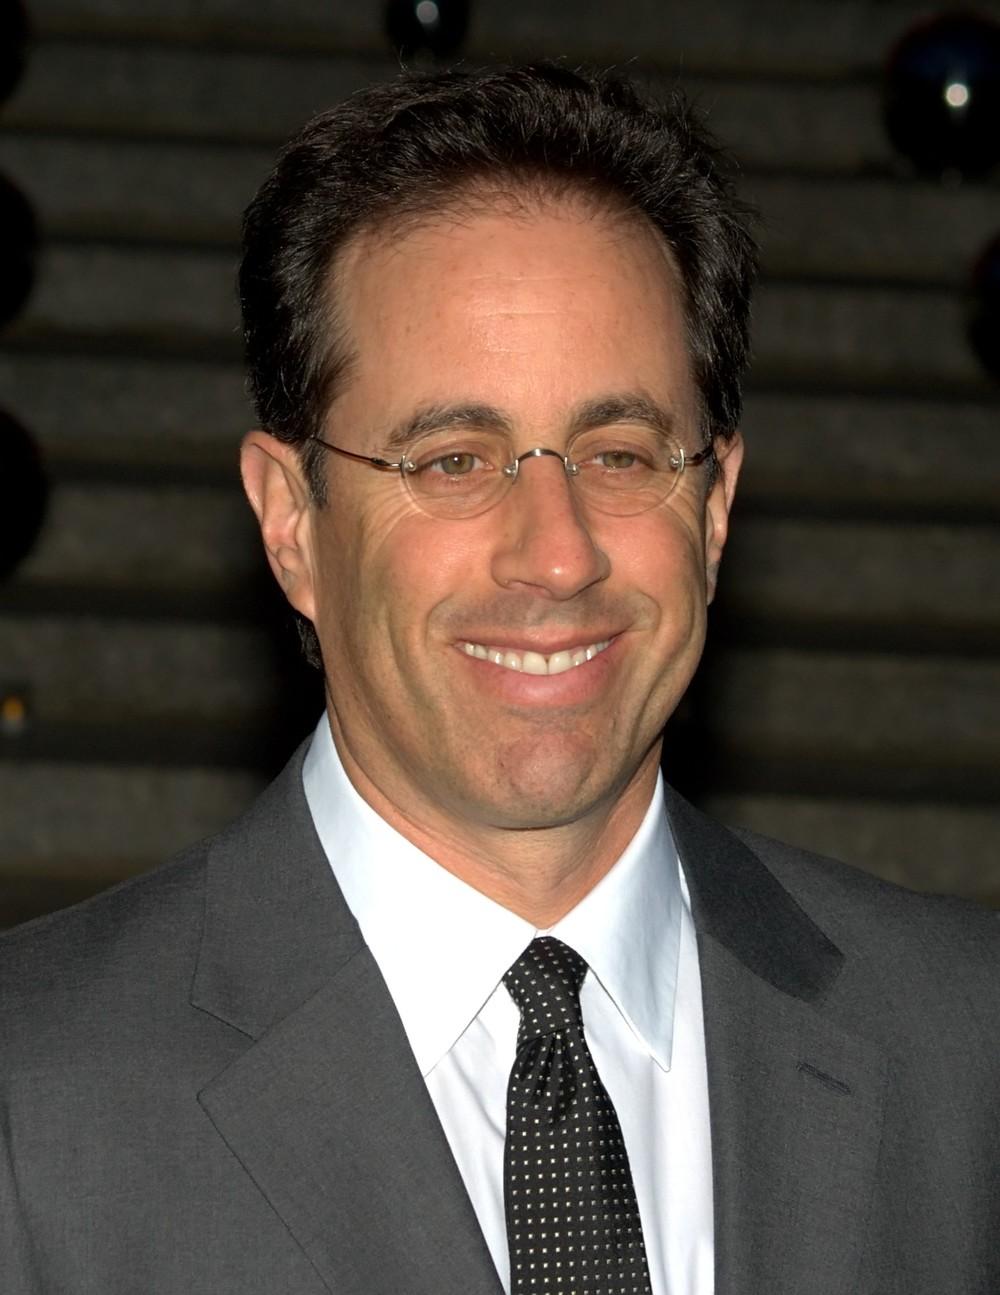 Jerry Seinfeld. Credit: David Shankbone.